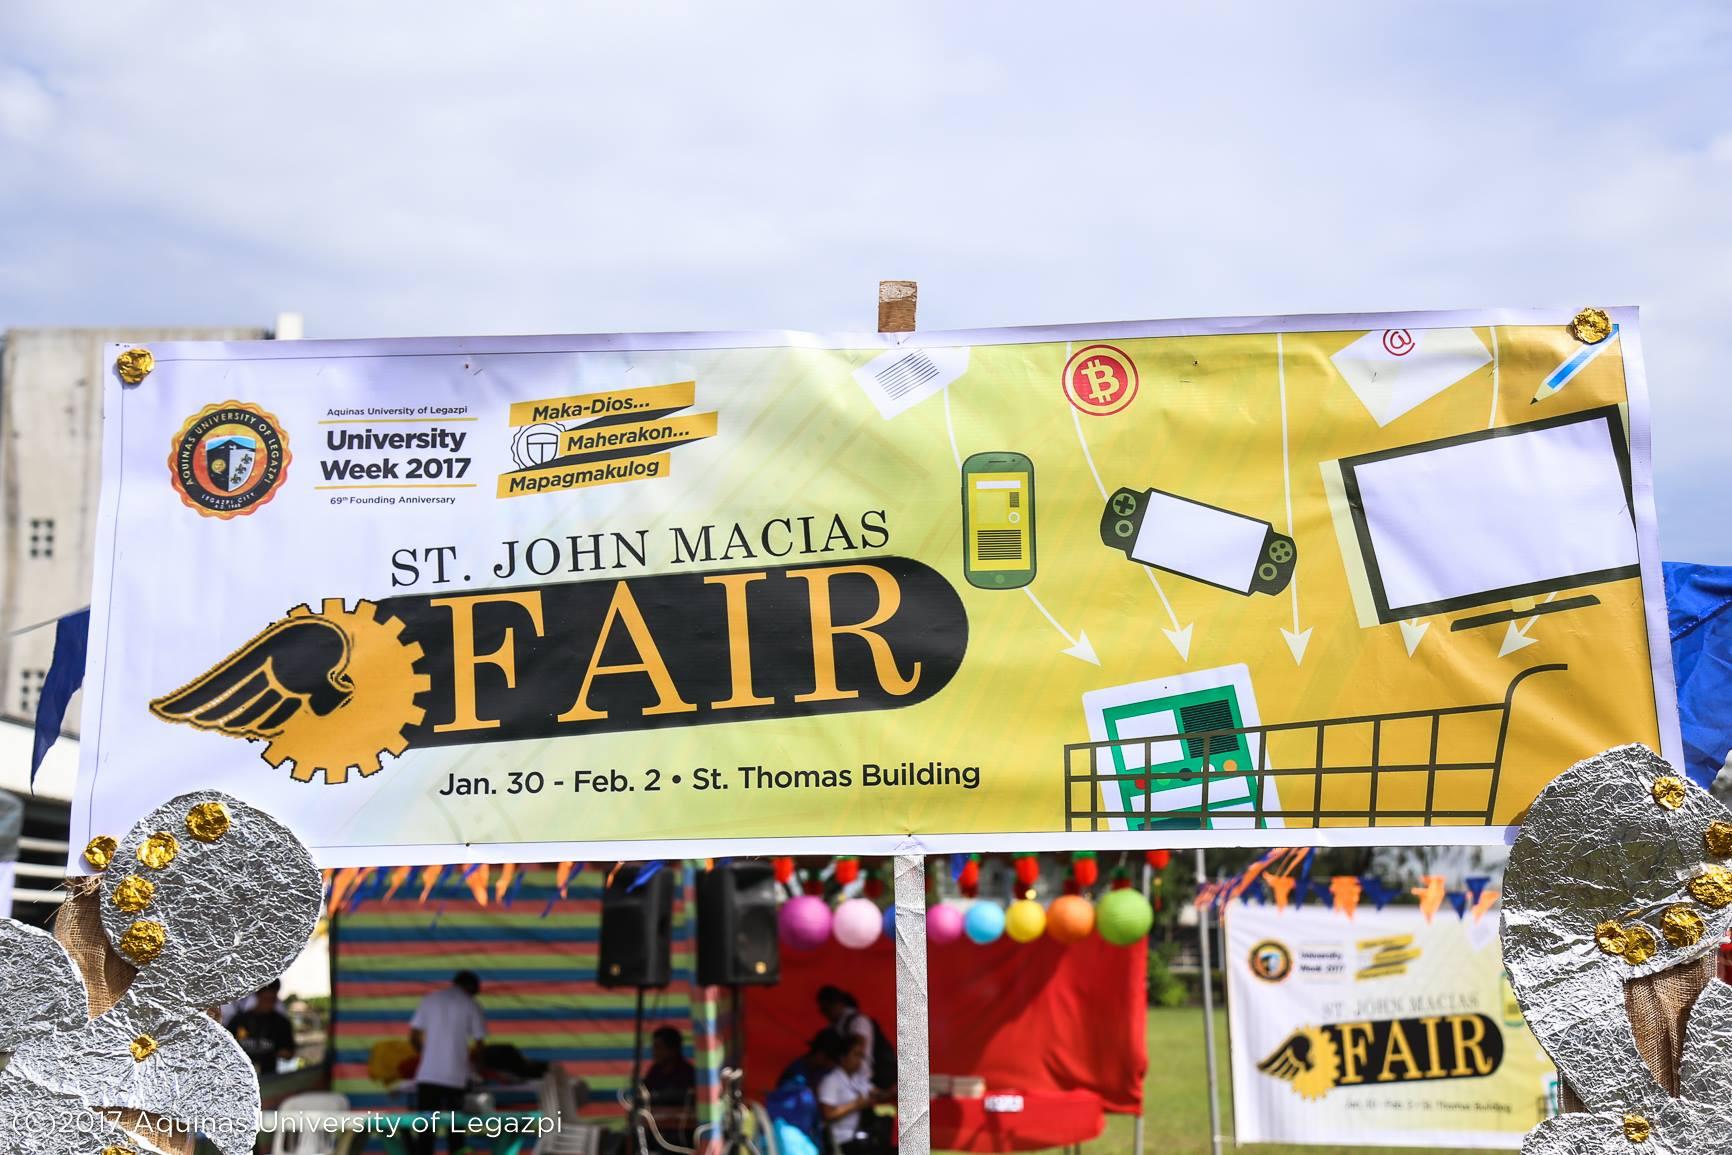 St. John Macias Trade Fair